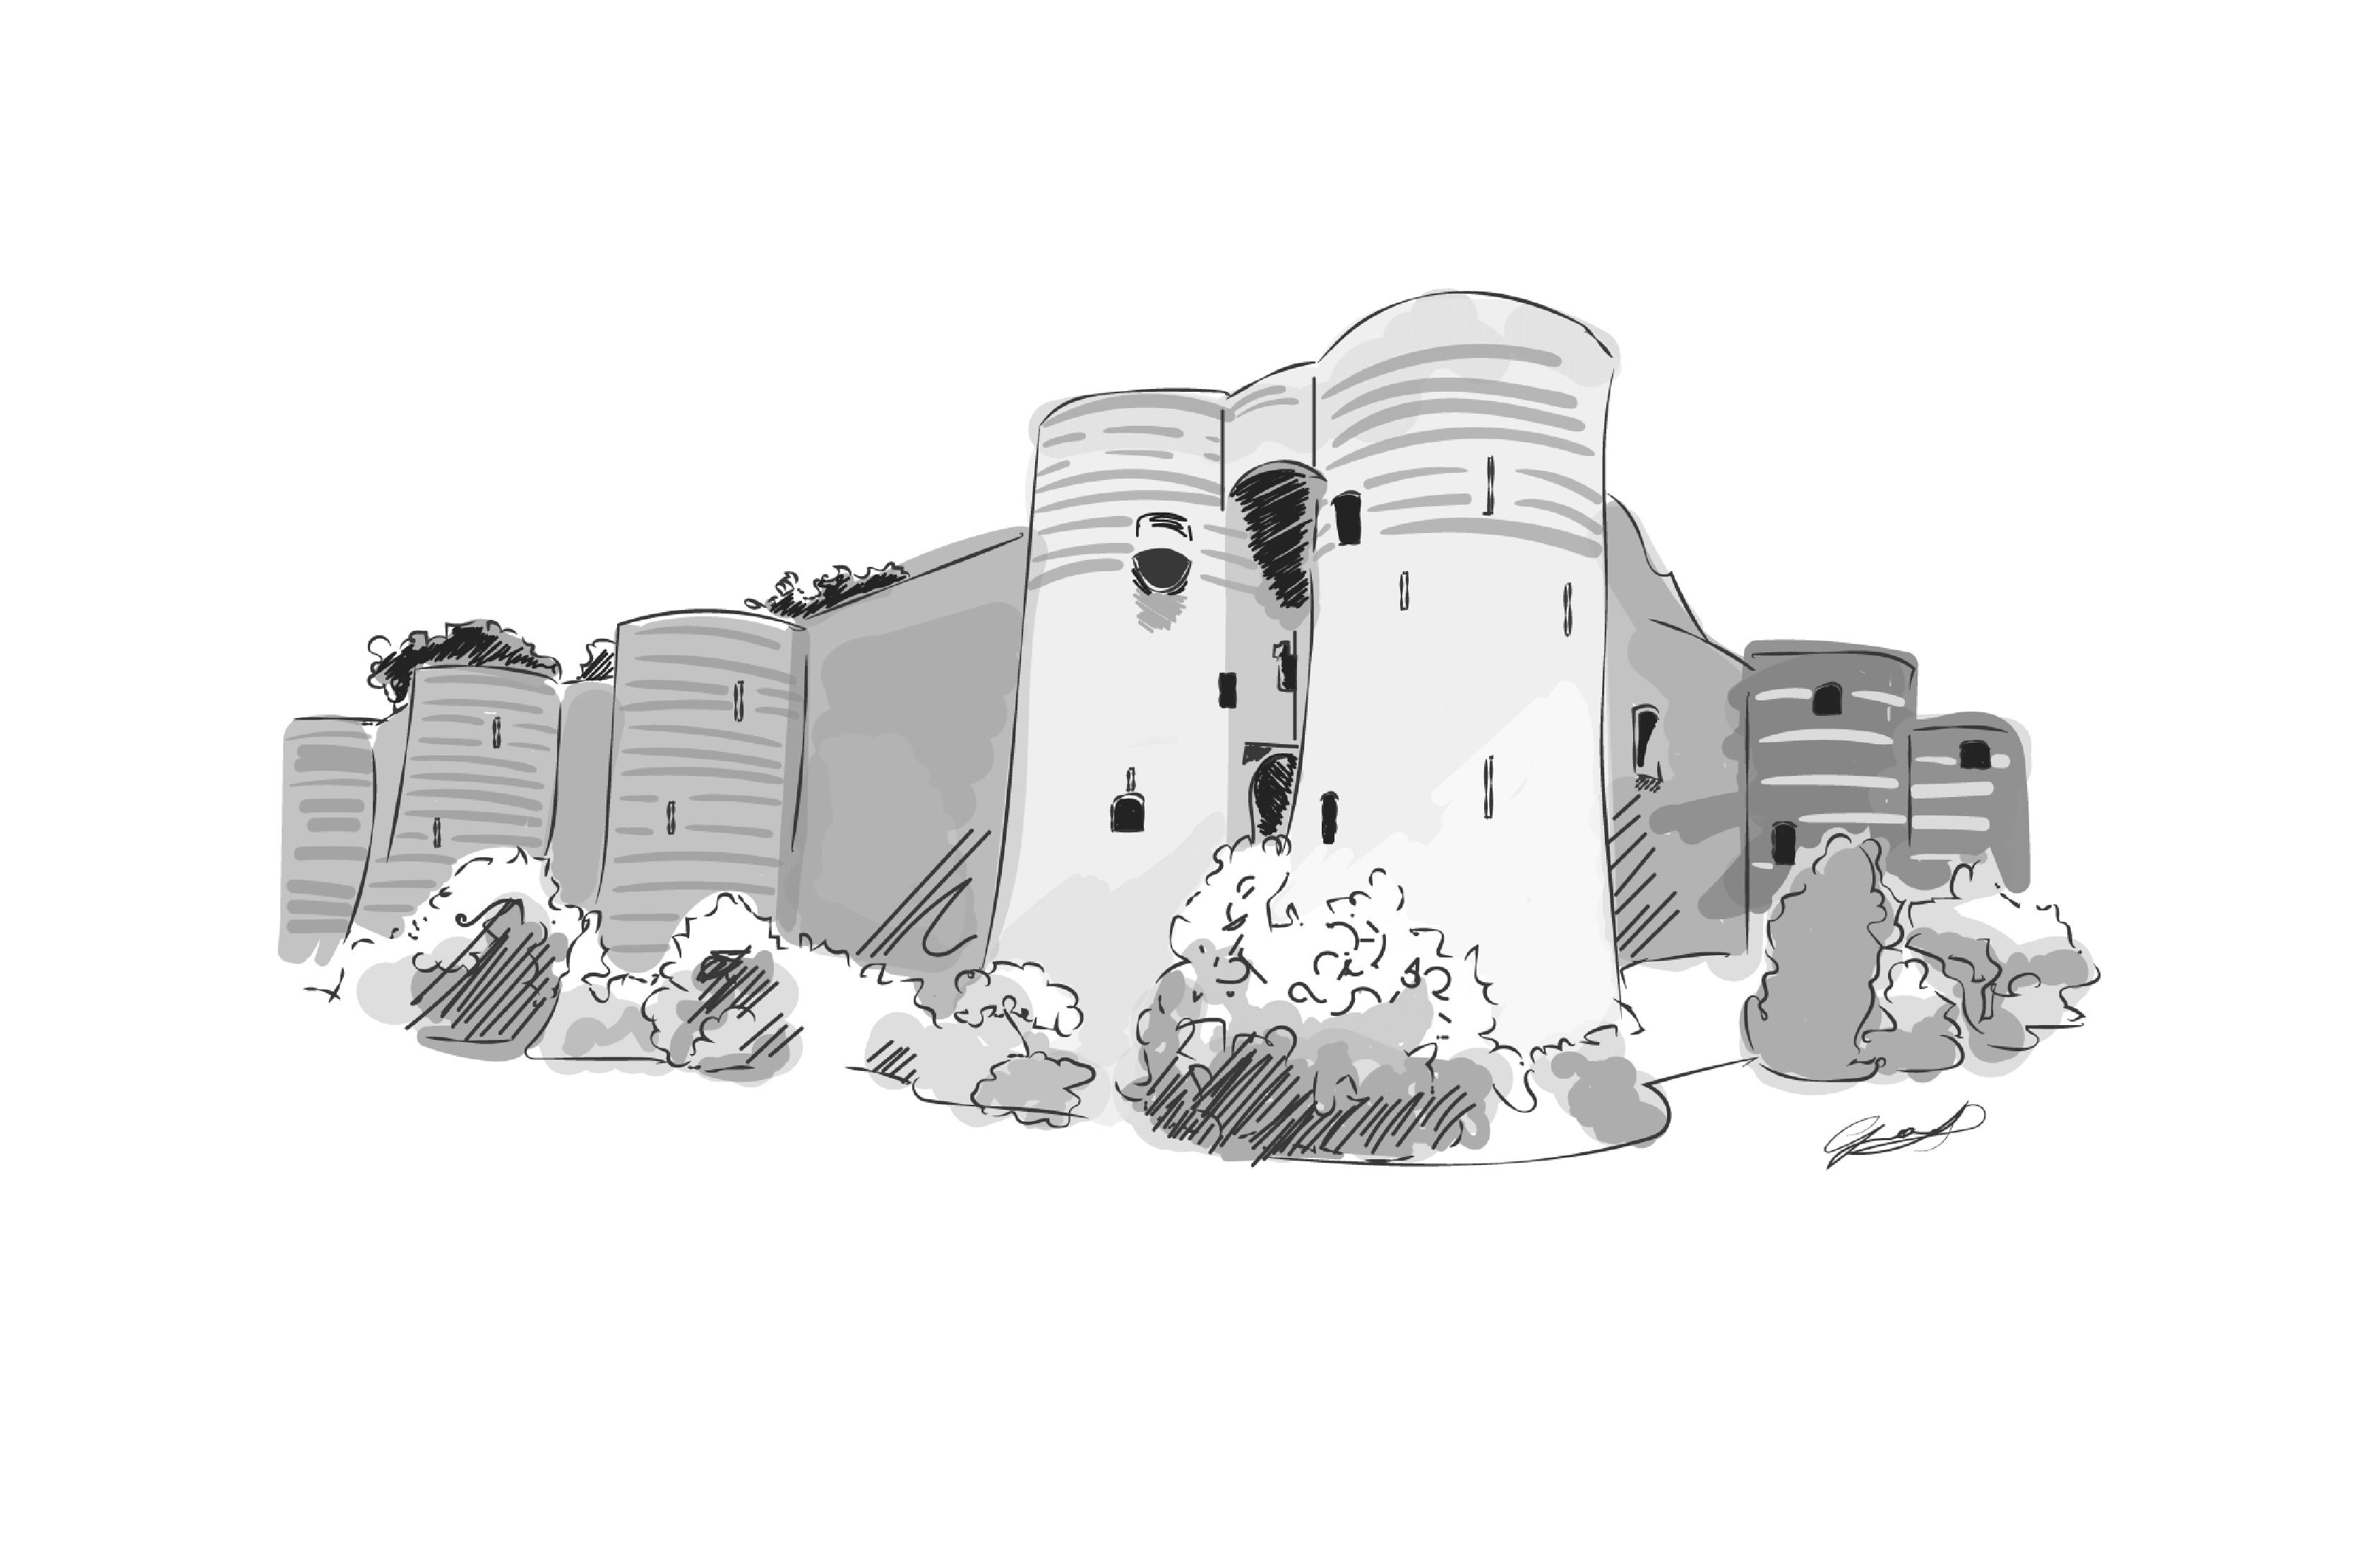 illustration chateau d'angers stephanie girard